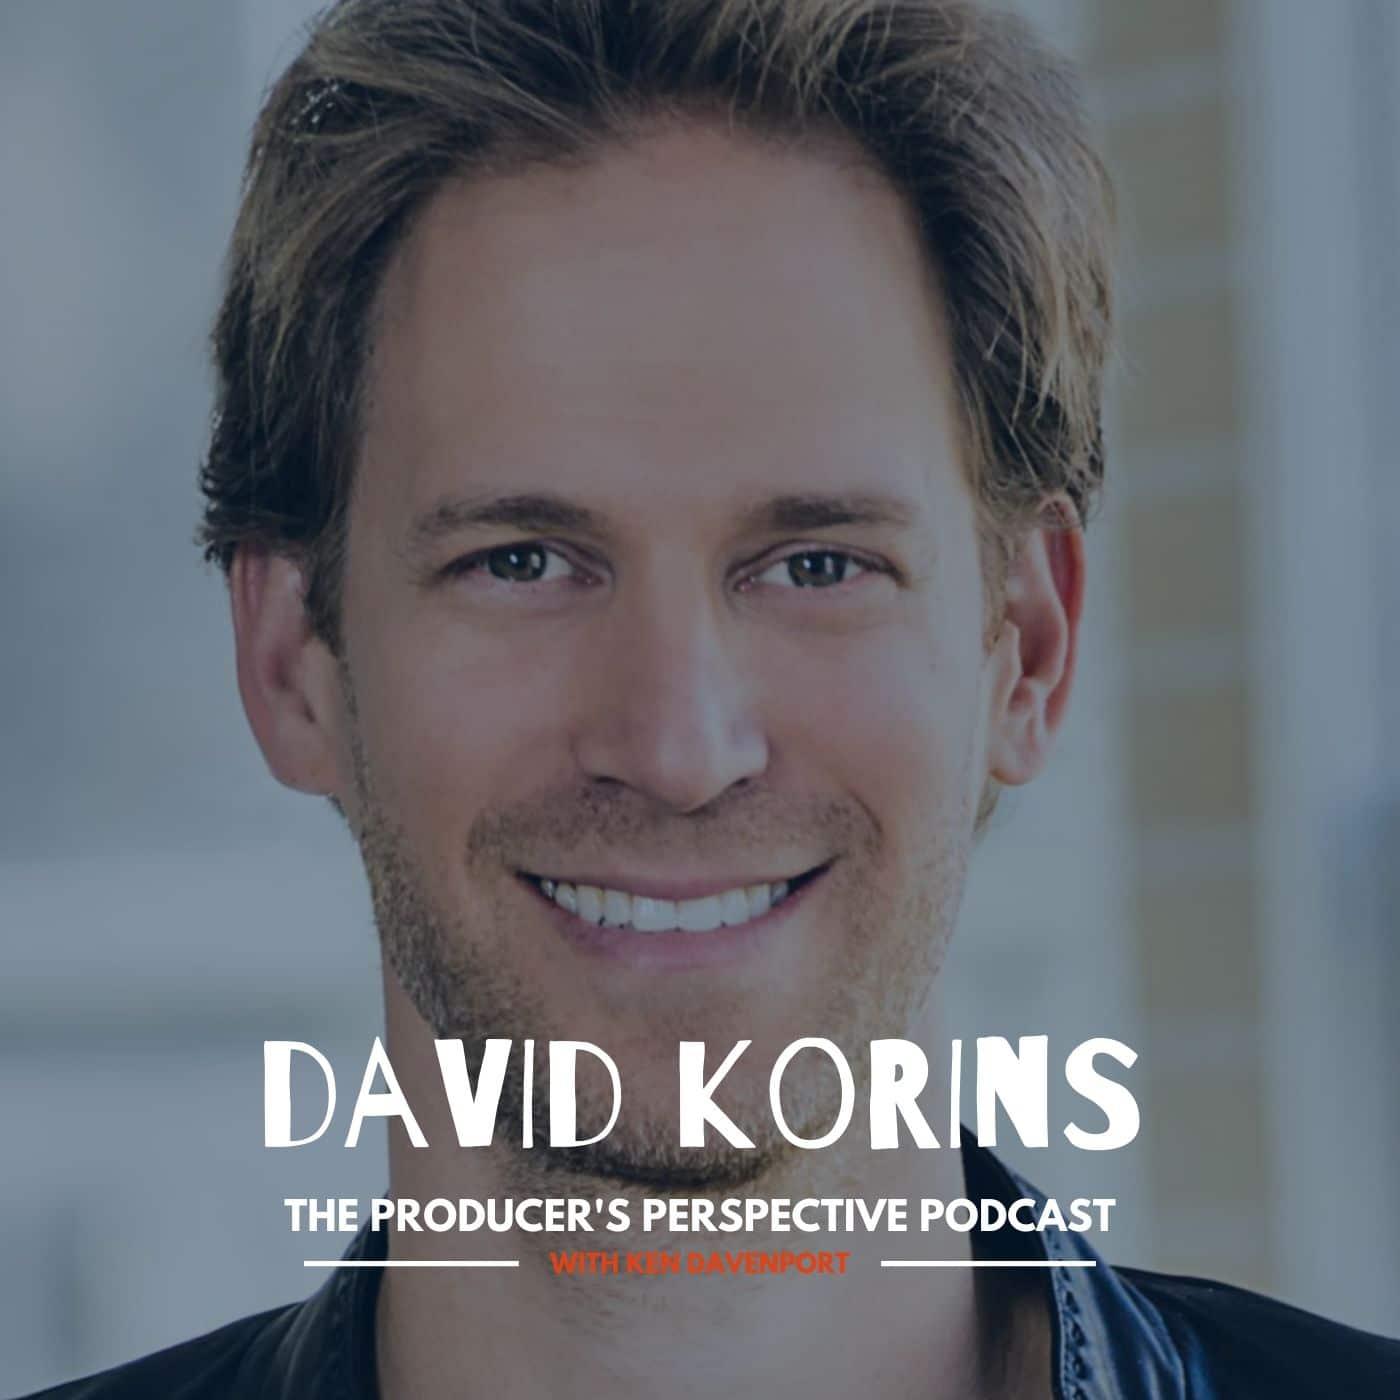 Ken Davenport's The Producer's Perspective Podcast Episode 132 - David Korins